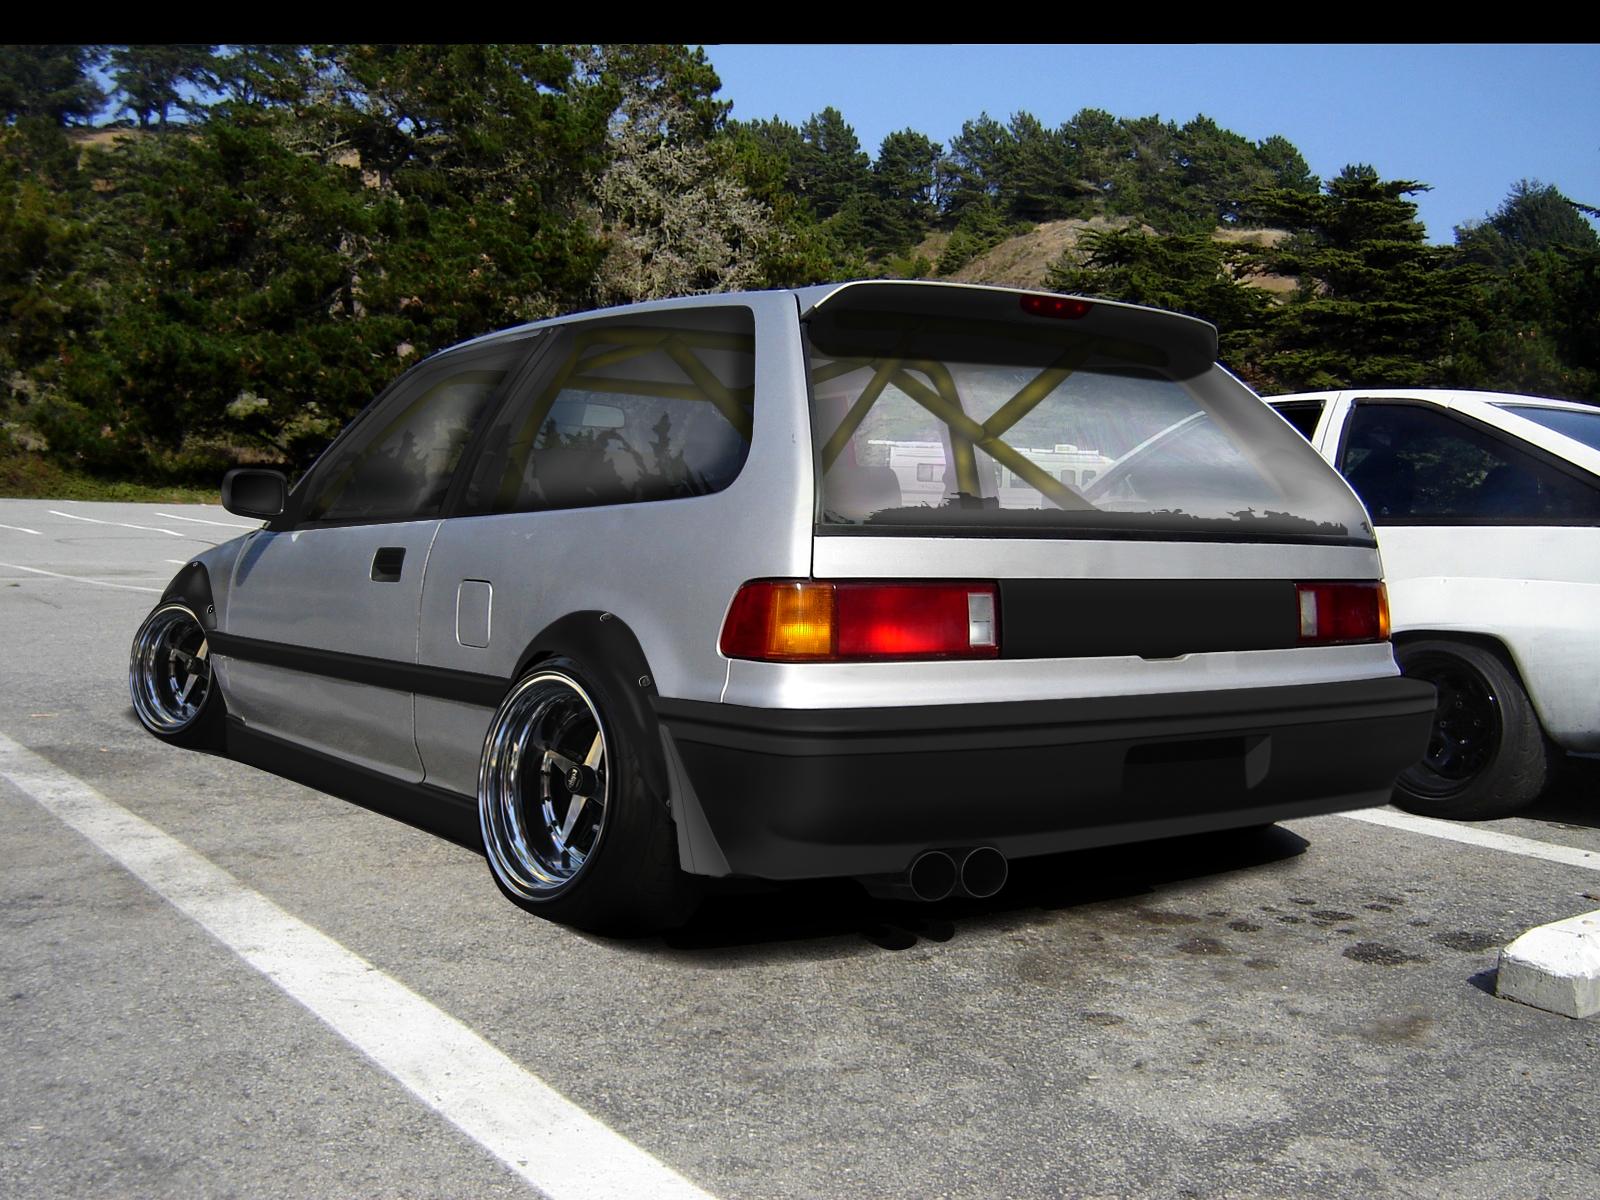 Honda Civic by DopeCreation by DopeCreation on DeviantArt